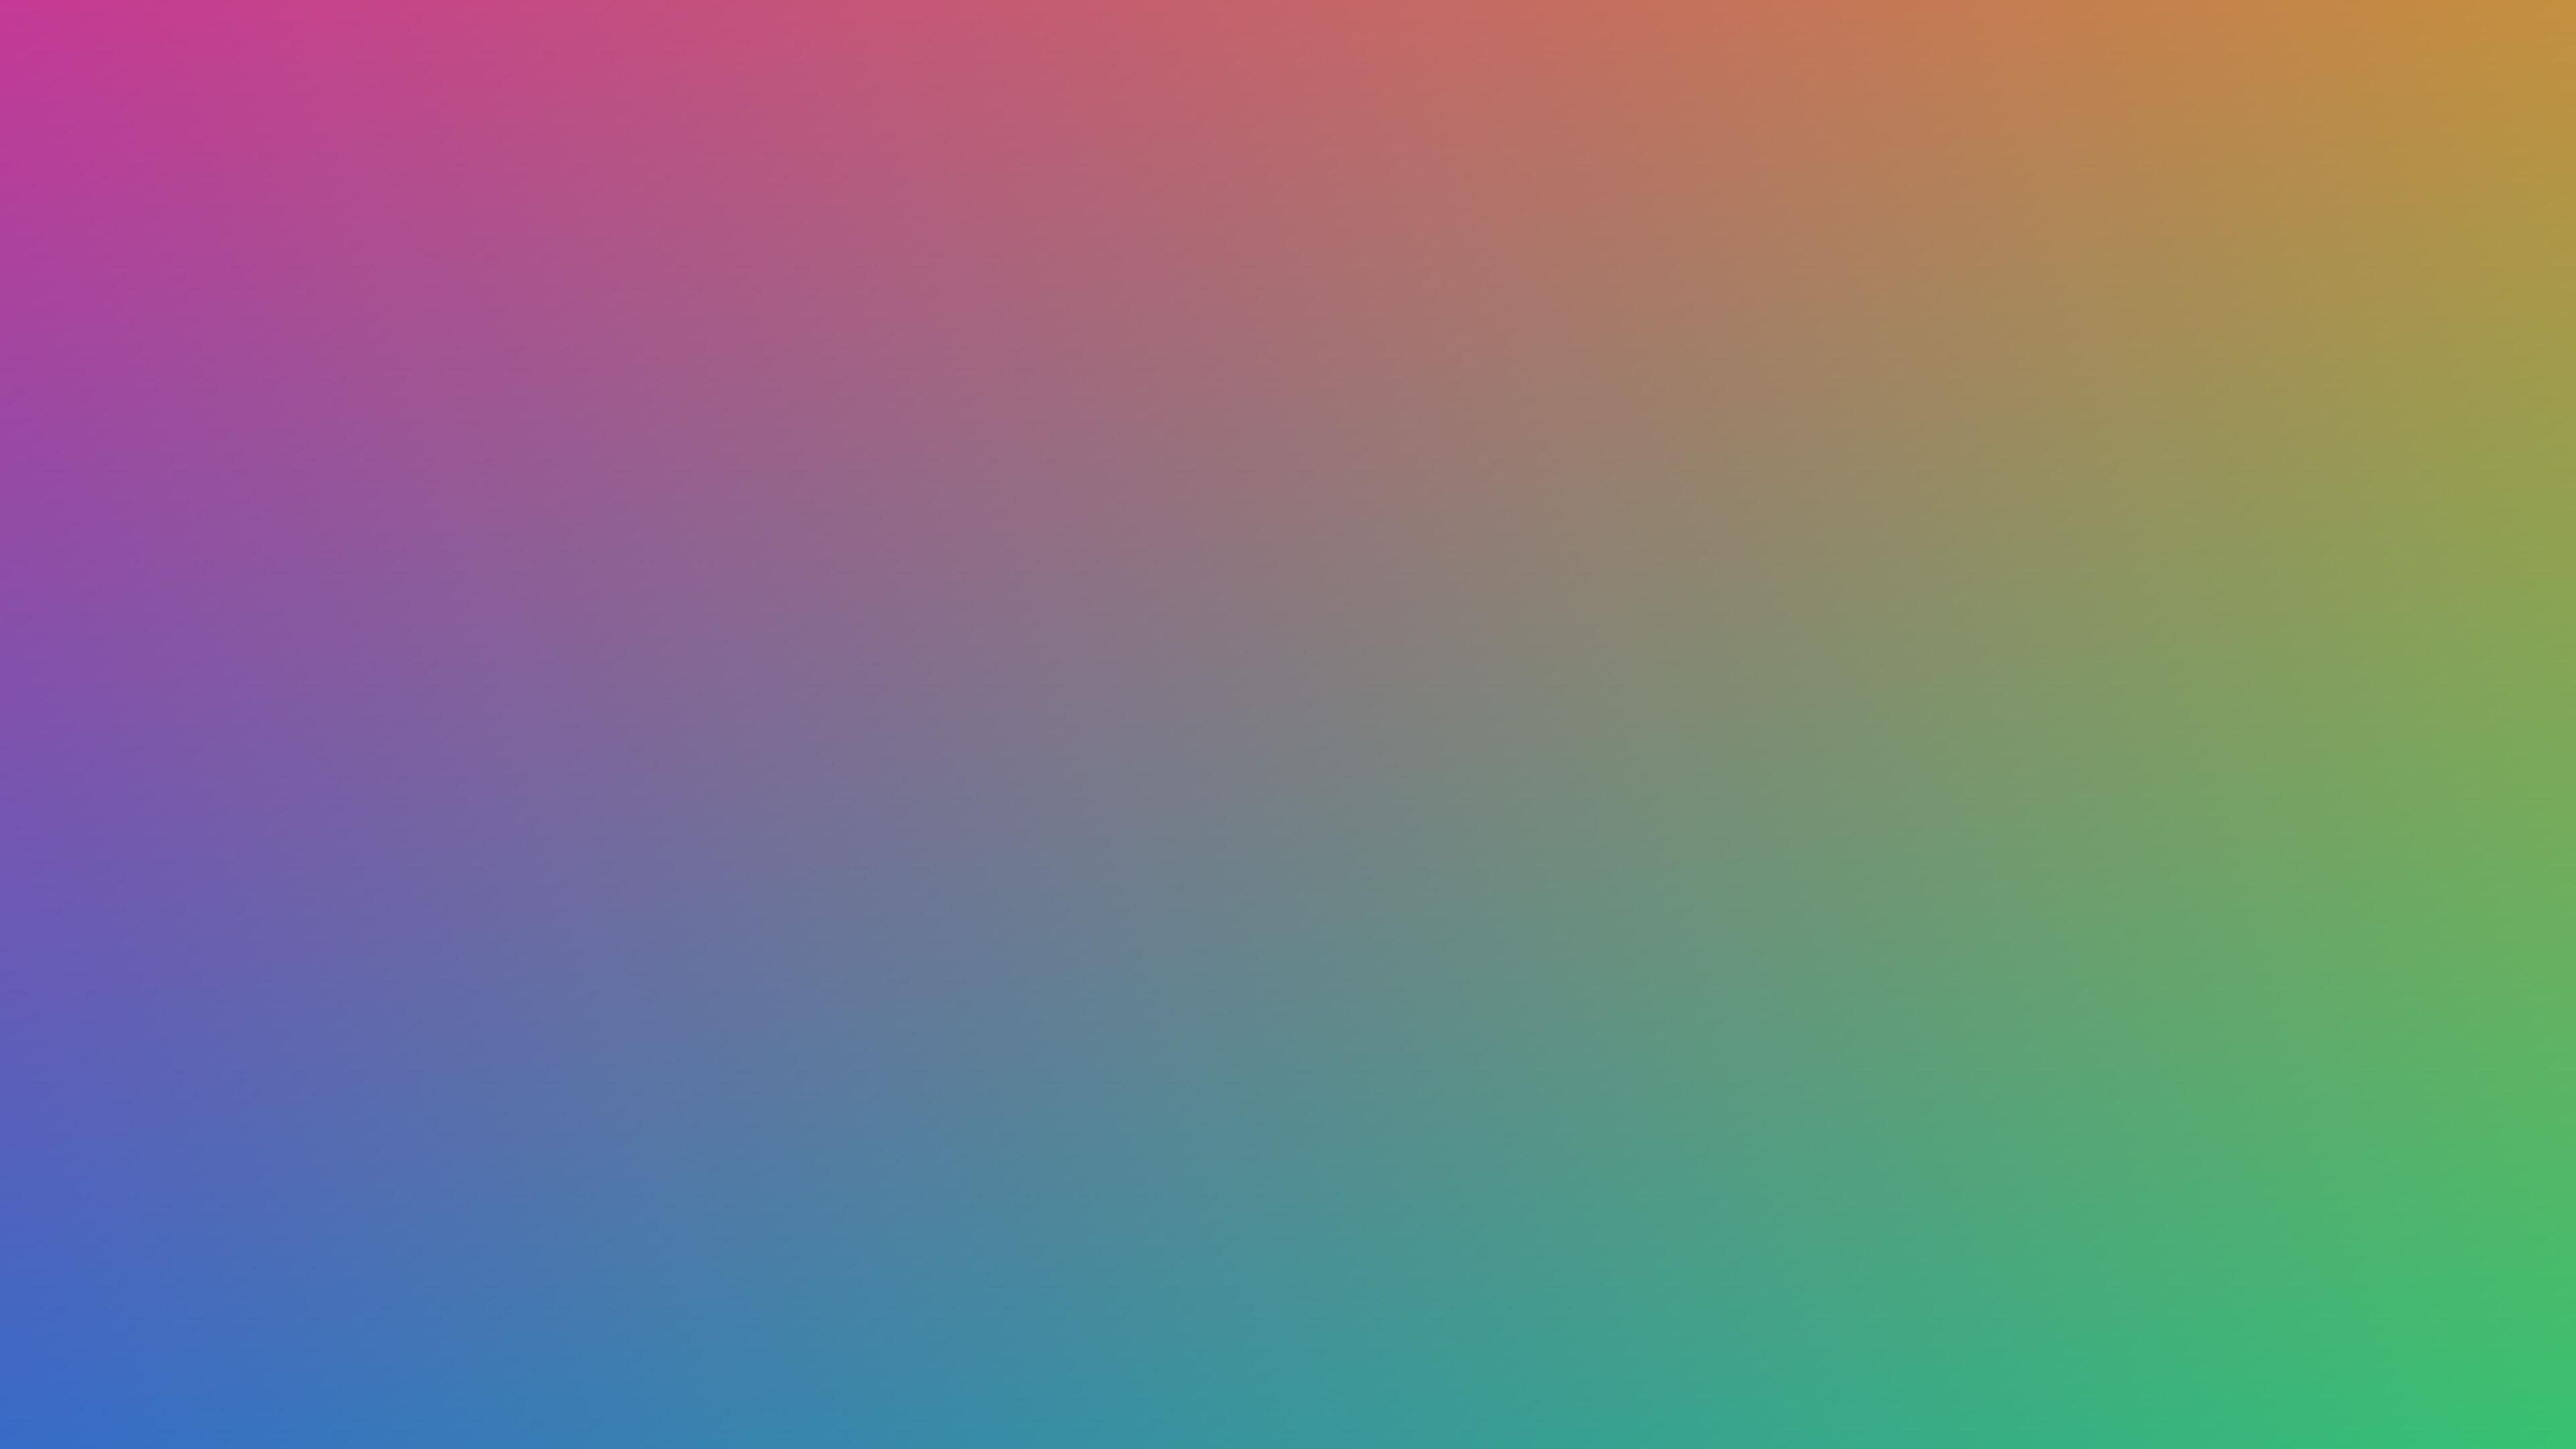 Fall Wallpaper For Iphone 7 Plus Sl87 Color Rainbow Blur Gradation Wallpaper